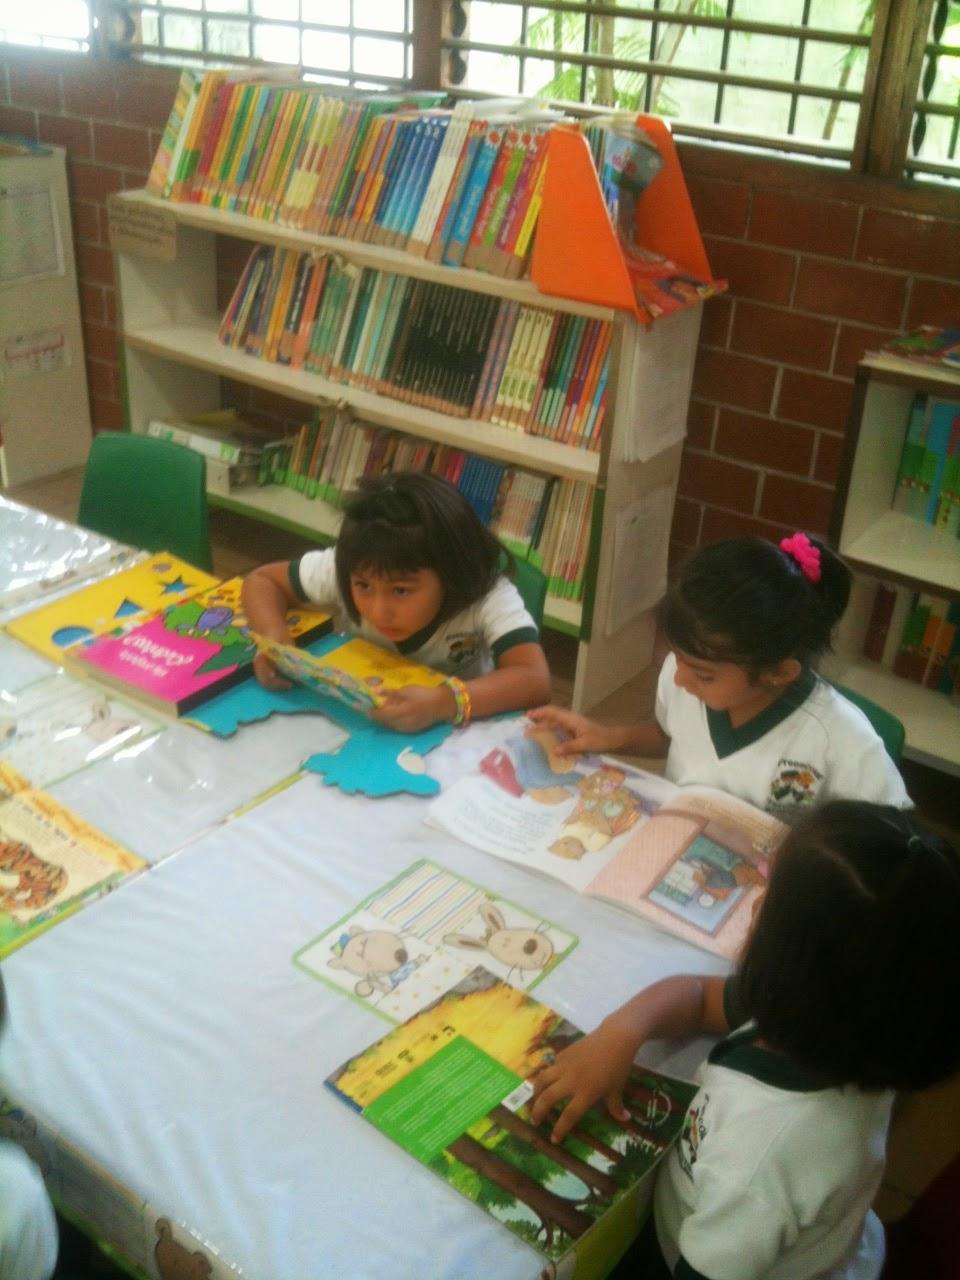 Jardin de ni os actividades para el fomento a la lectura for Actividades para ninos de jardin